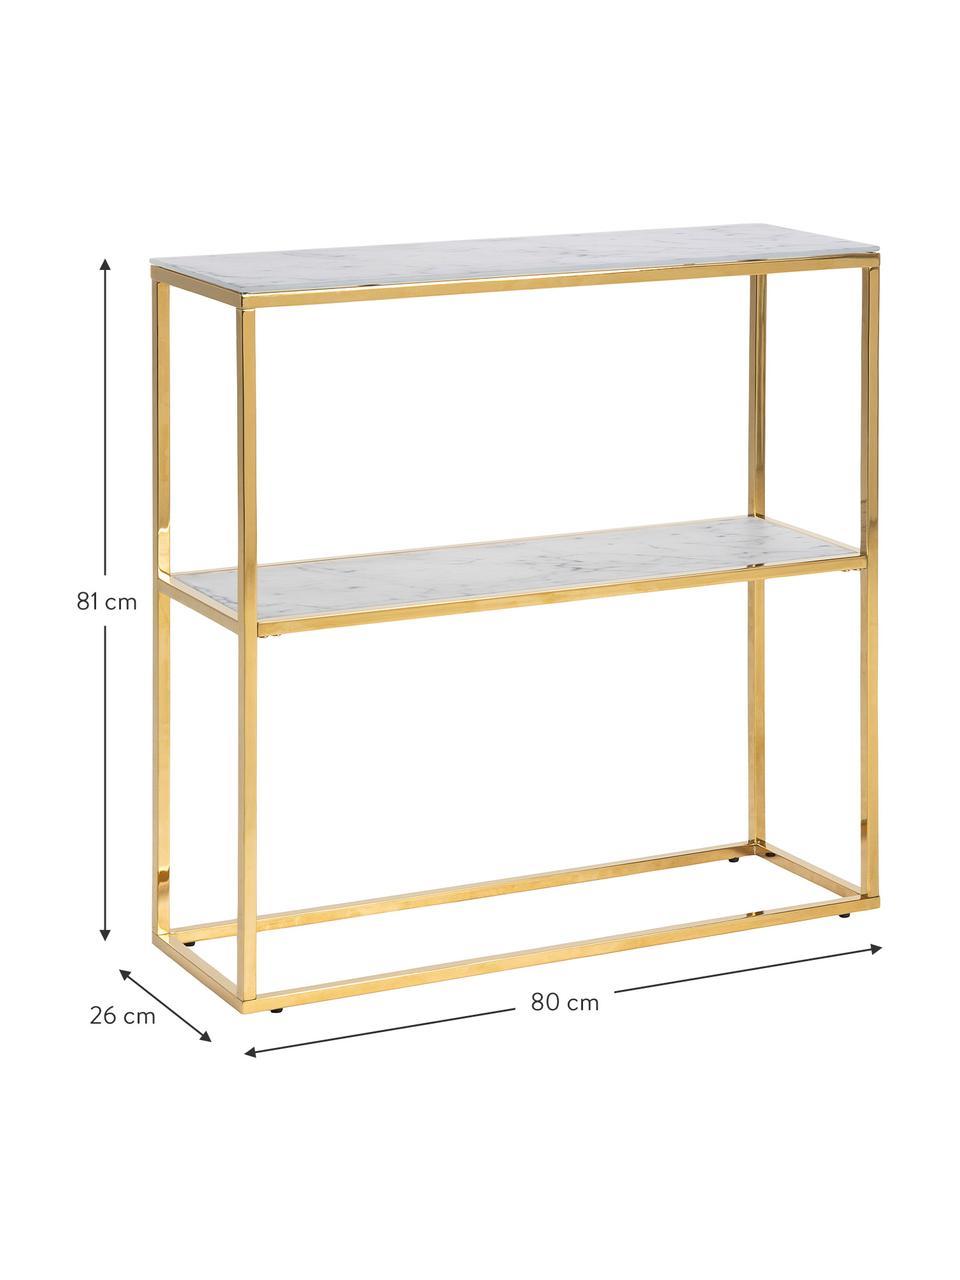 Metall-Regal Aruba mit Marmor-Optik, Tischplatte: Glas, Gestell: Metall, foliert, Weiß, Goldfarben, 80 x 81 cm